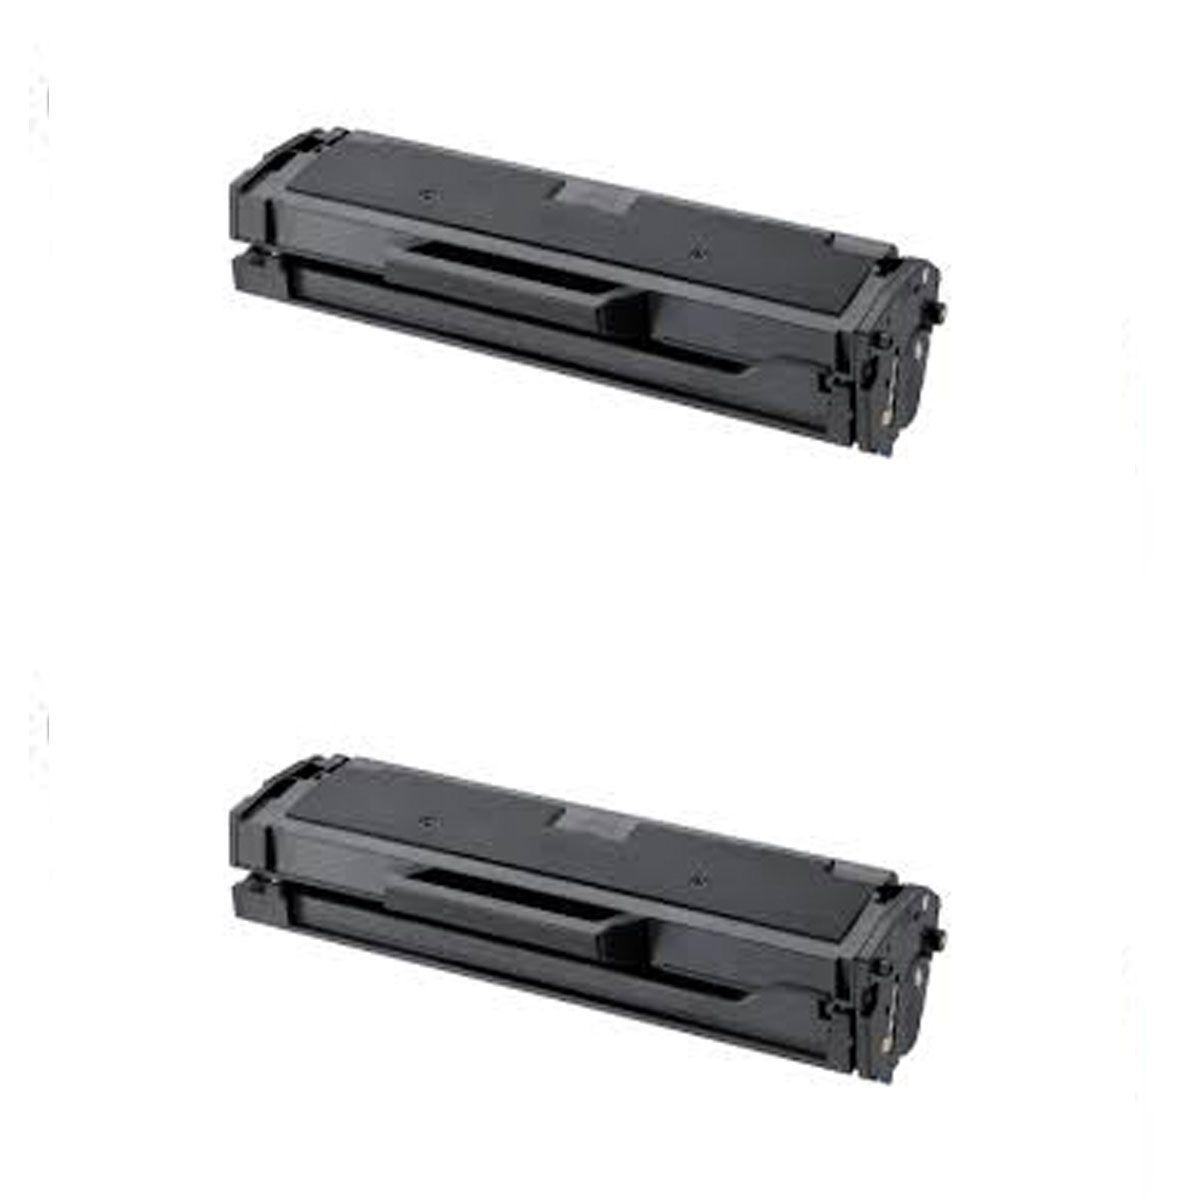 Kit 2 Toner Samsung D104S D104 104 - ML1665 ML1660 SCX3200 SCX3217 SCX3205 - Compativel 1W-AP0C-JPKI